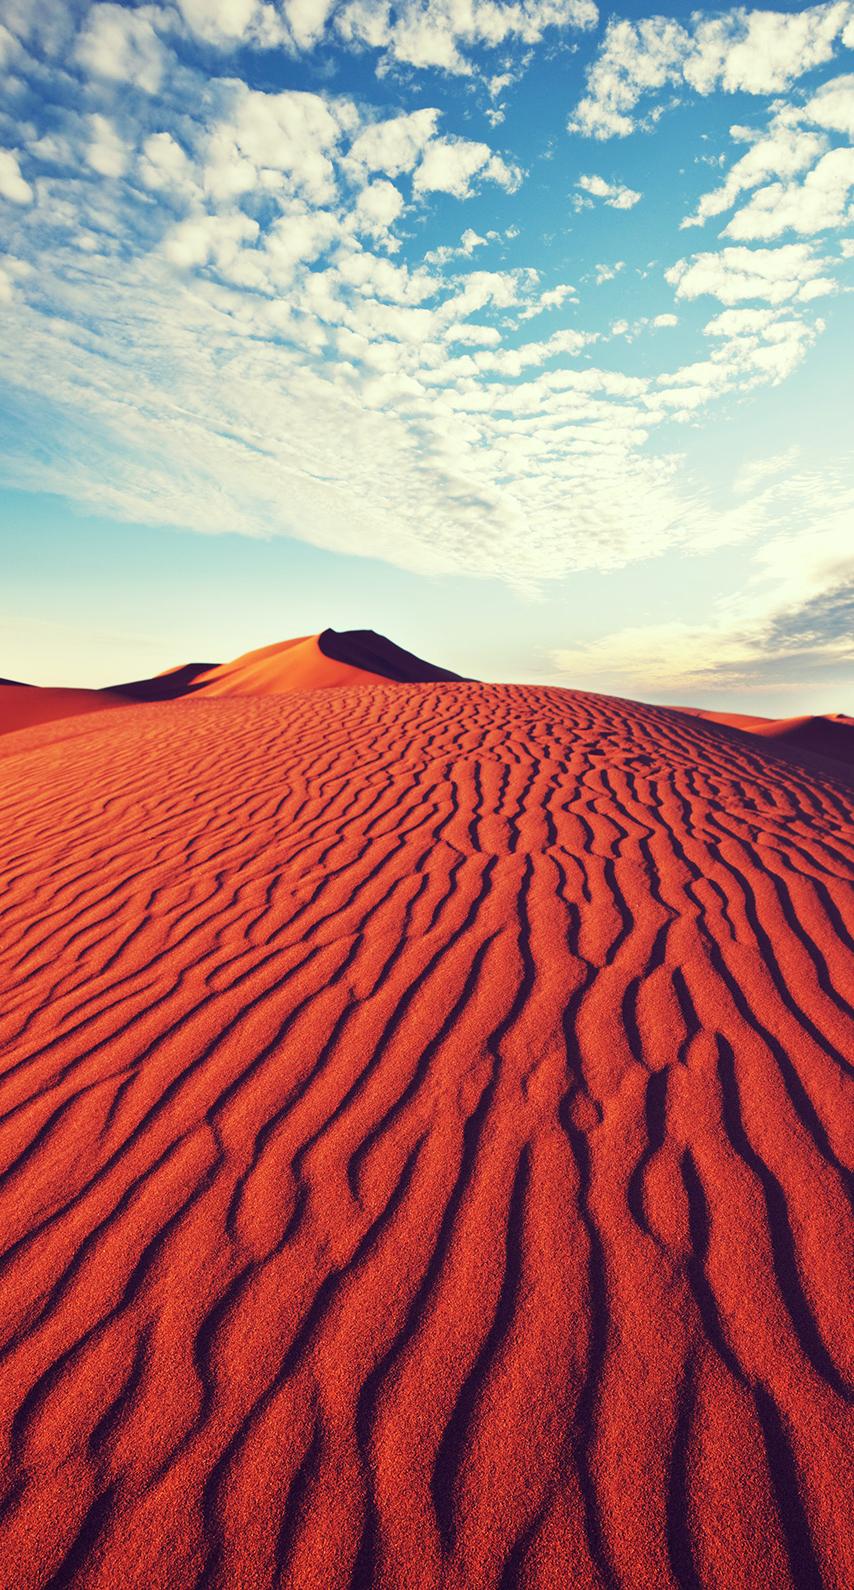 arid, drought